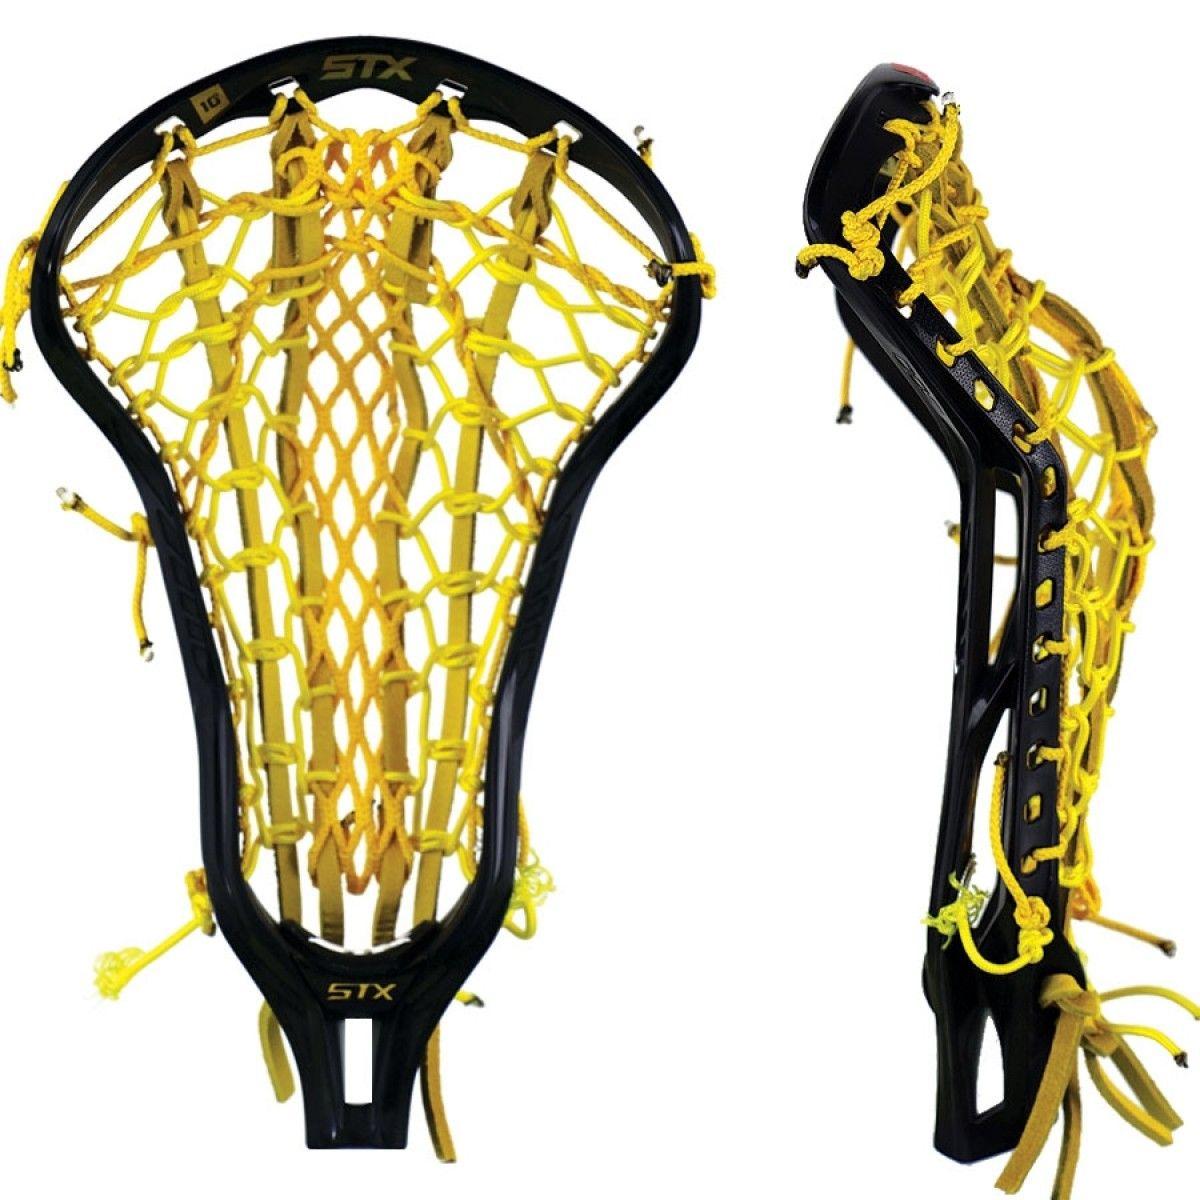 Stx Crux 600 Black W Yellow Venom Mesh Pocket Lowest Price Guaranteed Womens Lacrosse Womens Lacrosse Sticks Lacrosse Girls